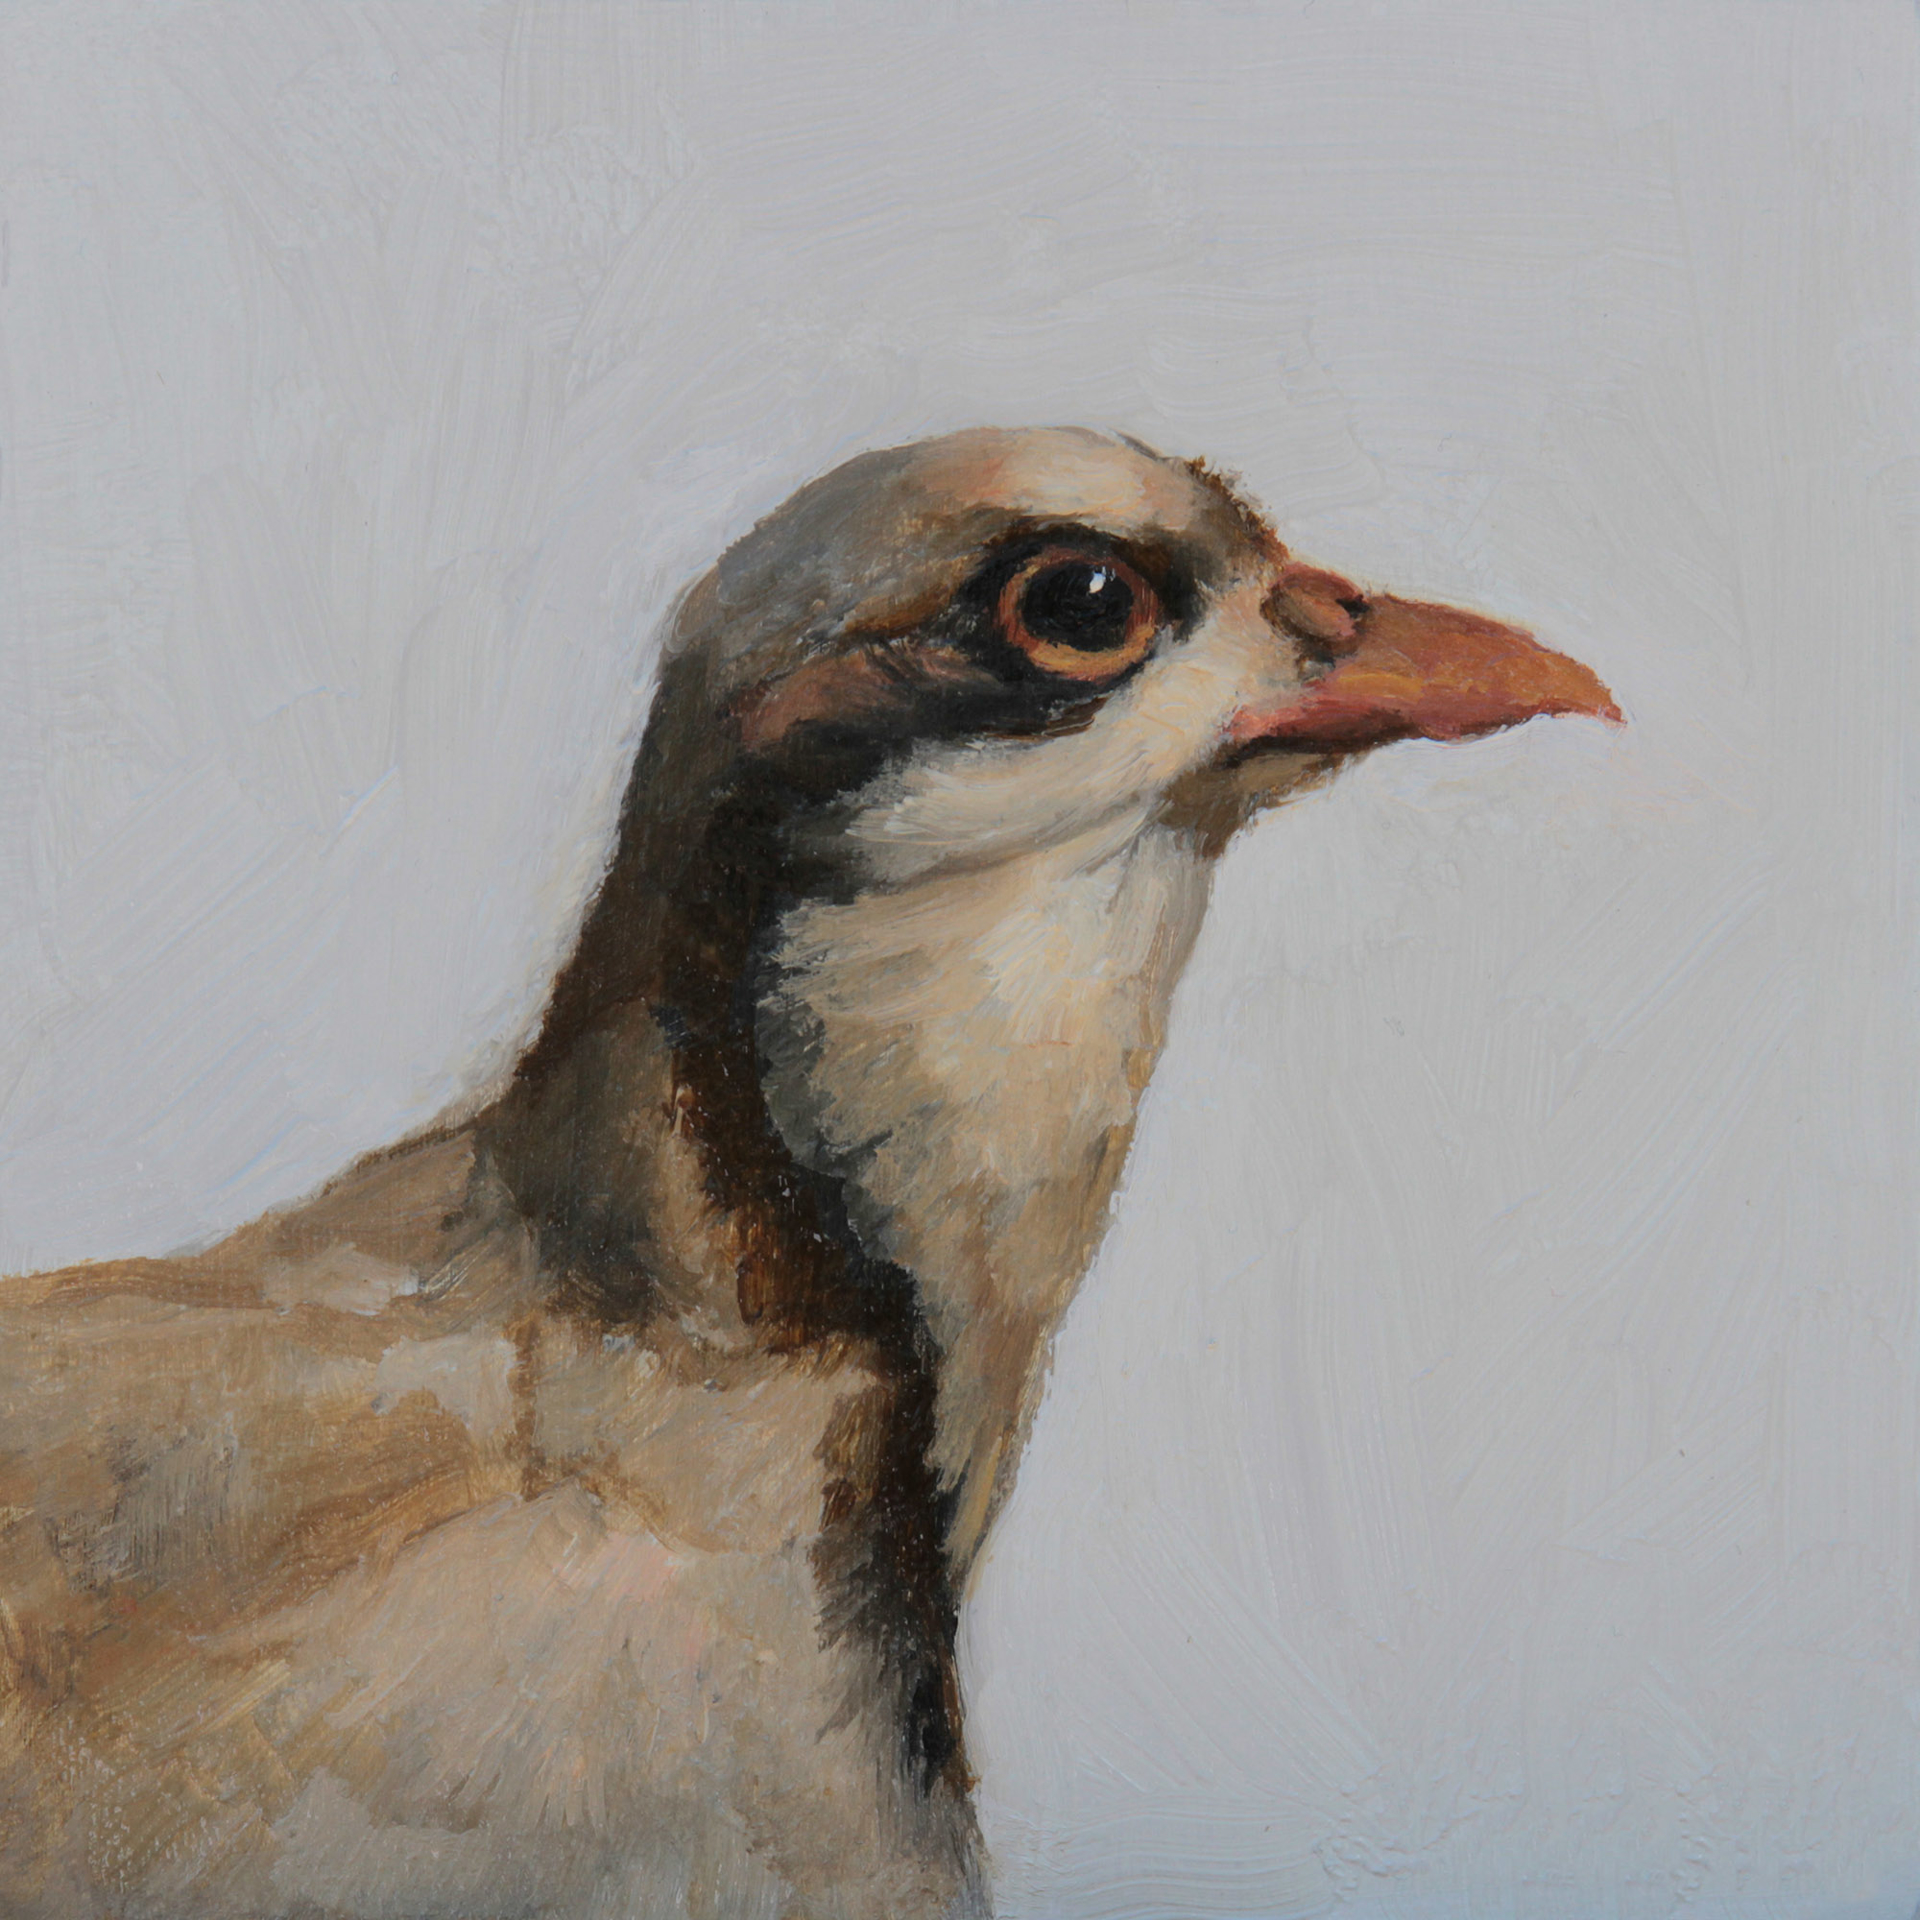 Chukar Partridge by Linda Tracey Brandon